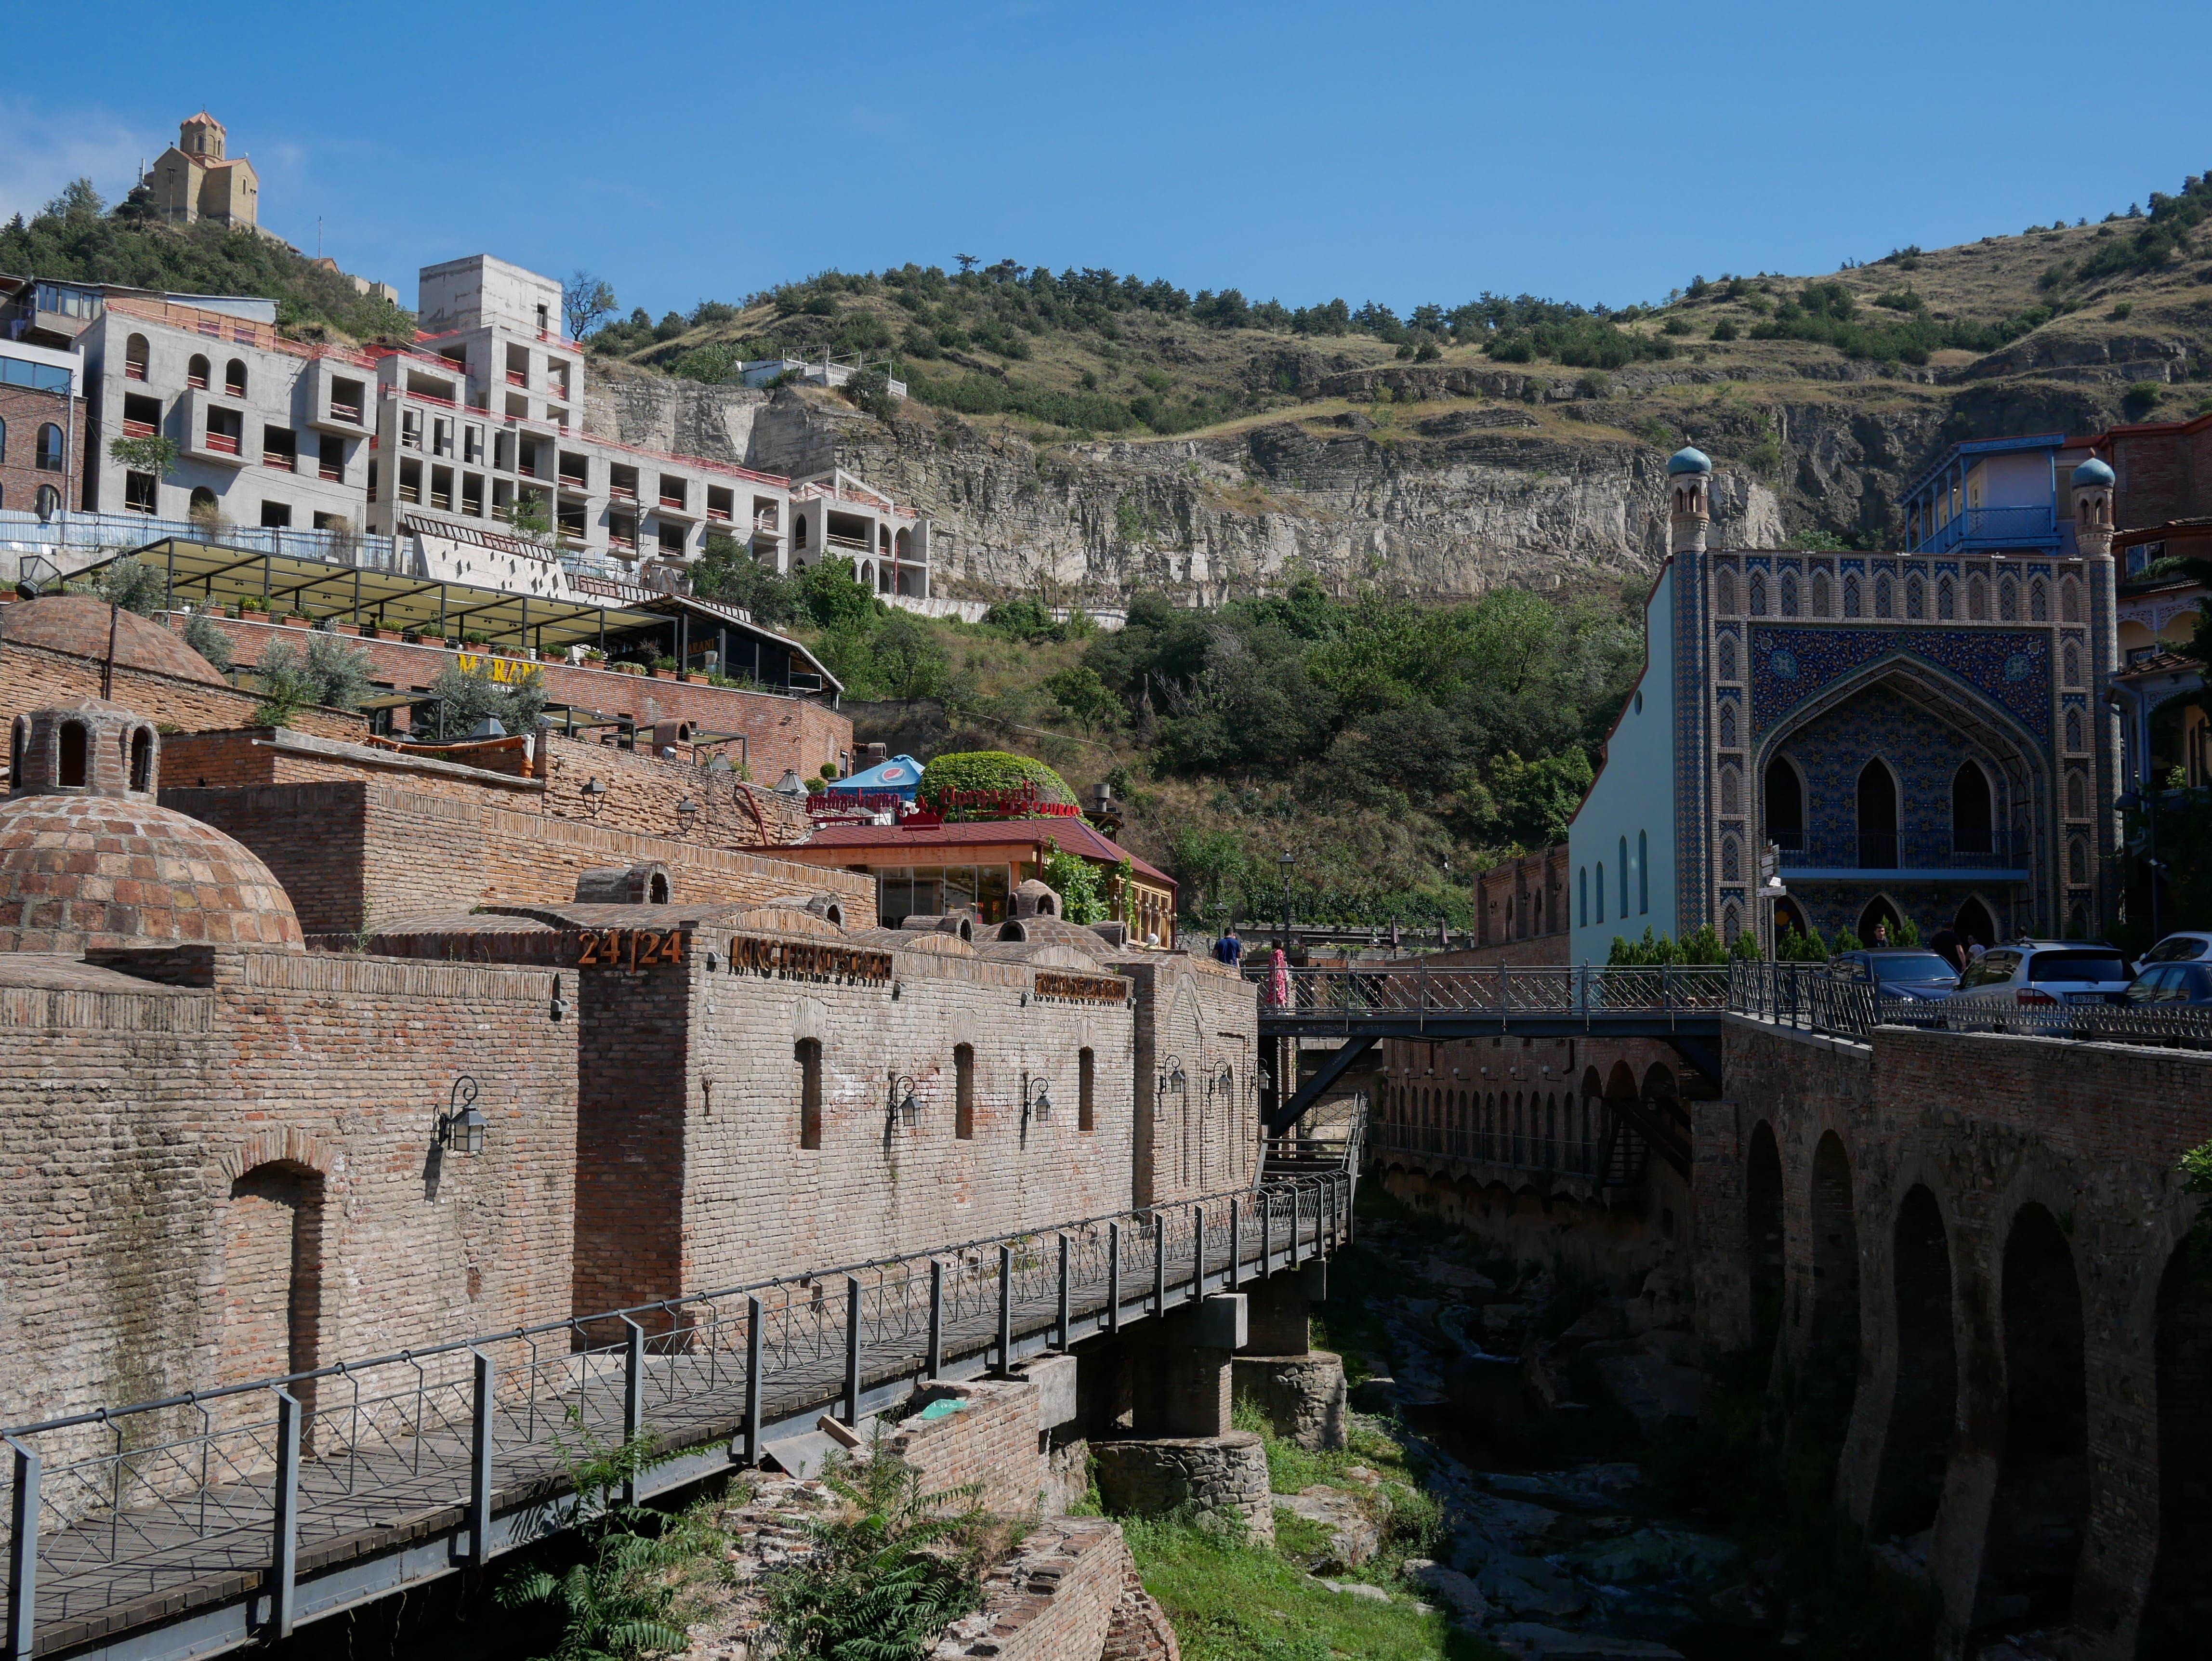 Les bains turcs de Tbilissi